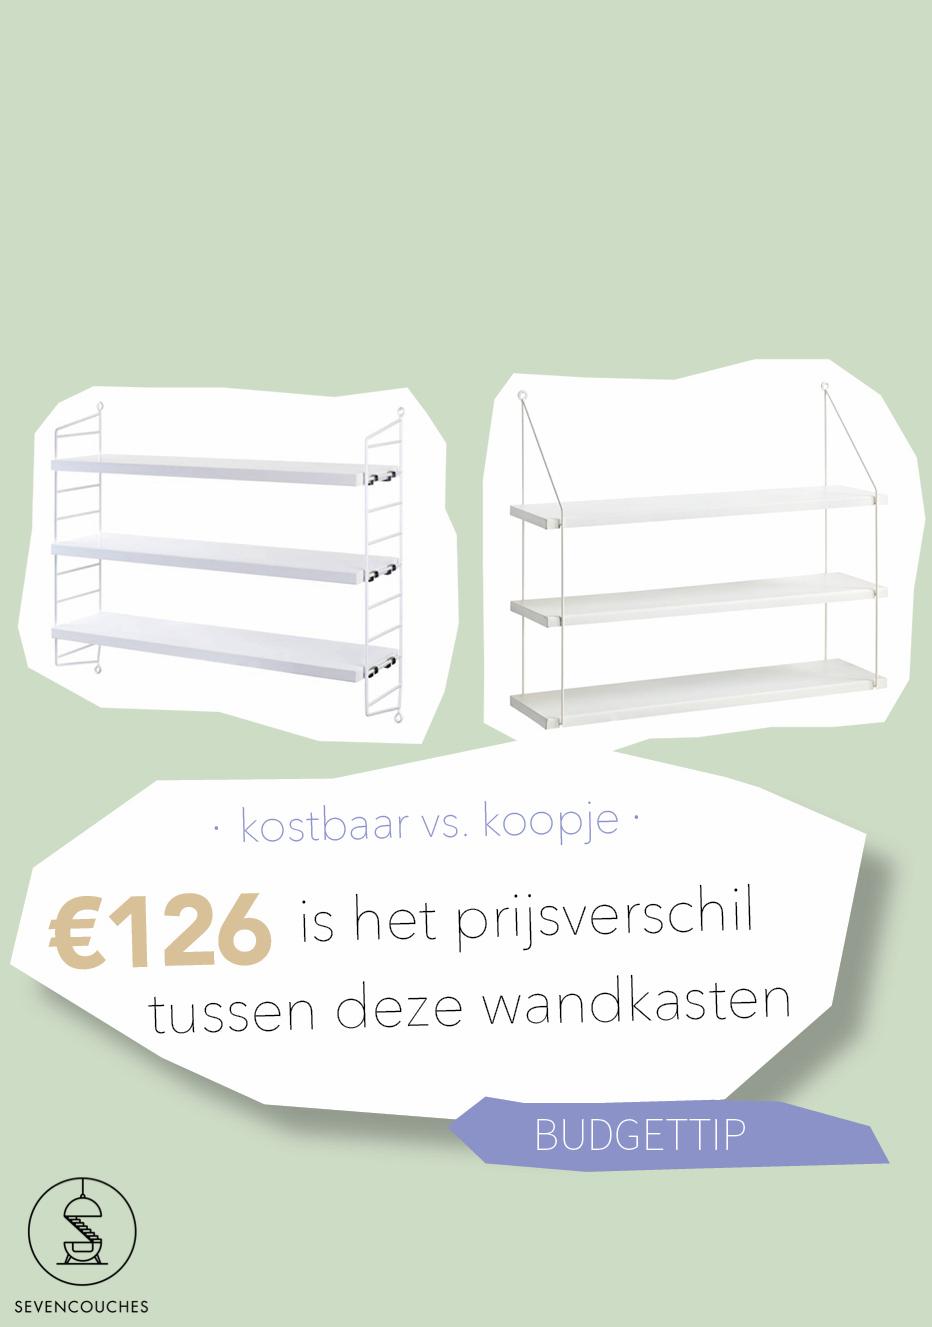 Kostbaar vs. koopje: wandkast met drie planken